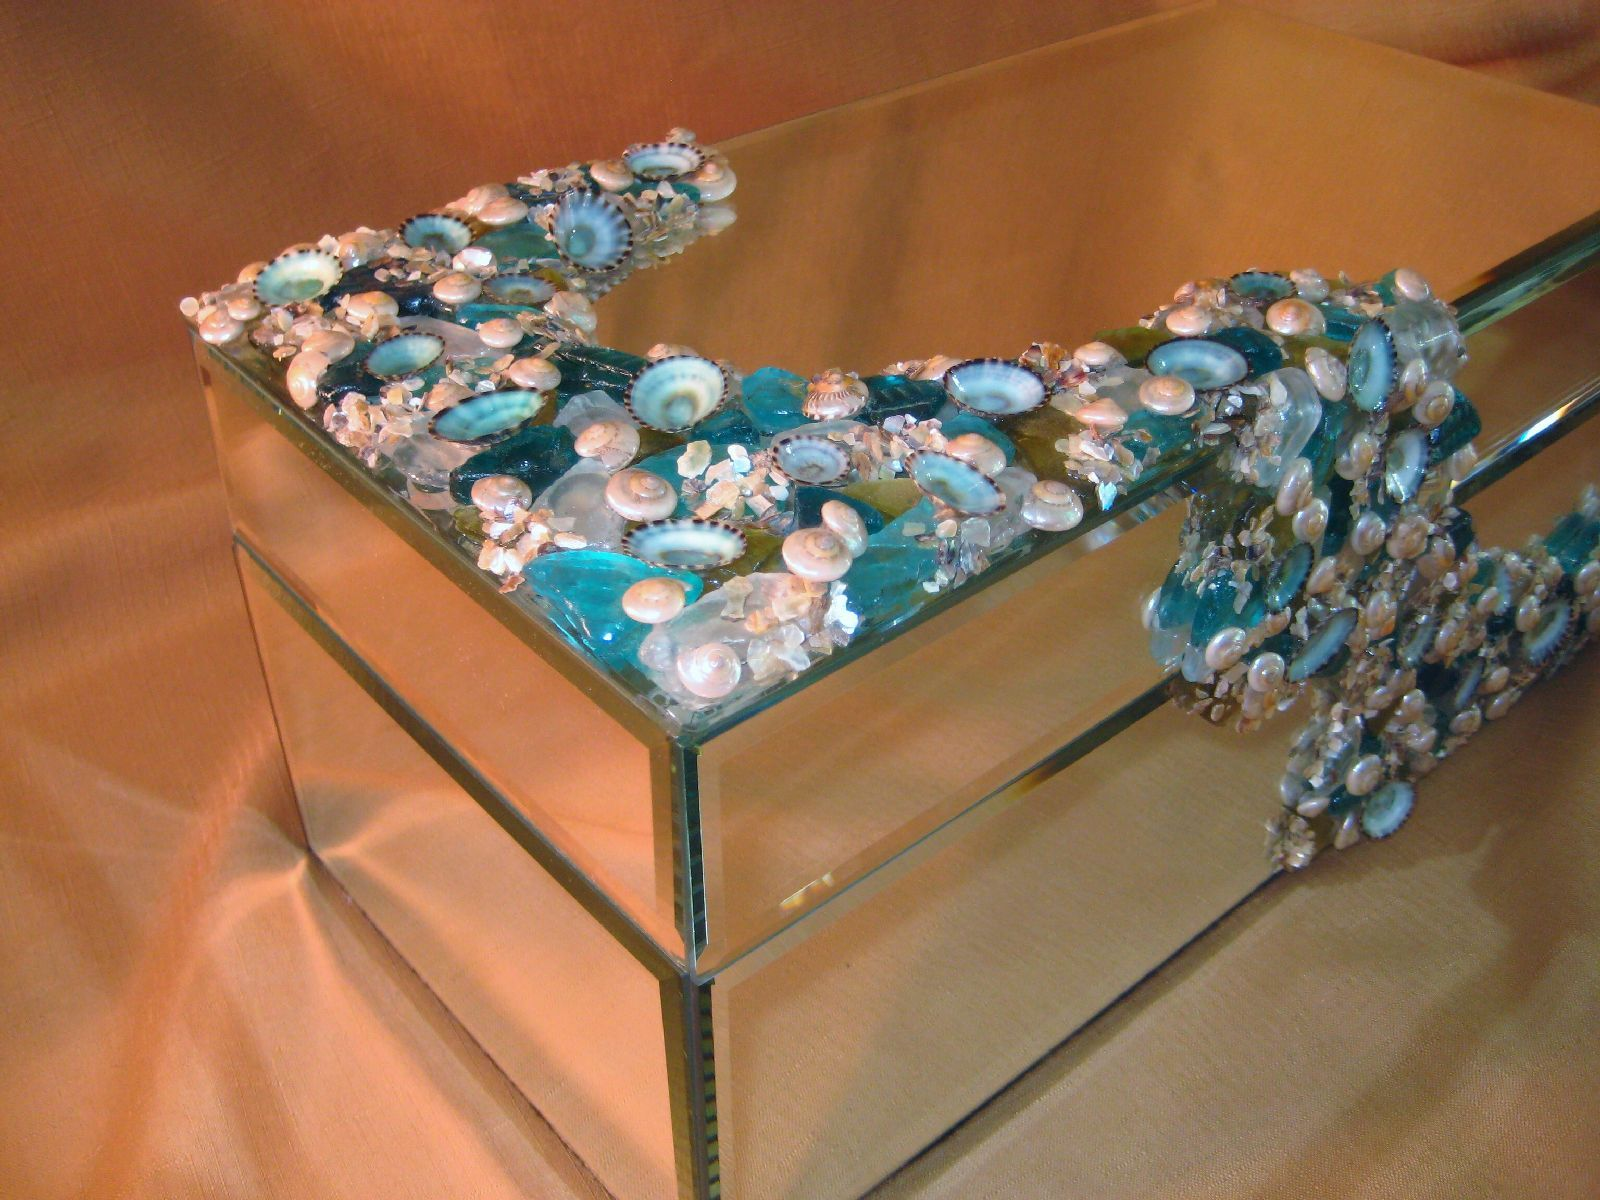 teal jewelry Item seaglassmosaicmirrortreasureboxseashell